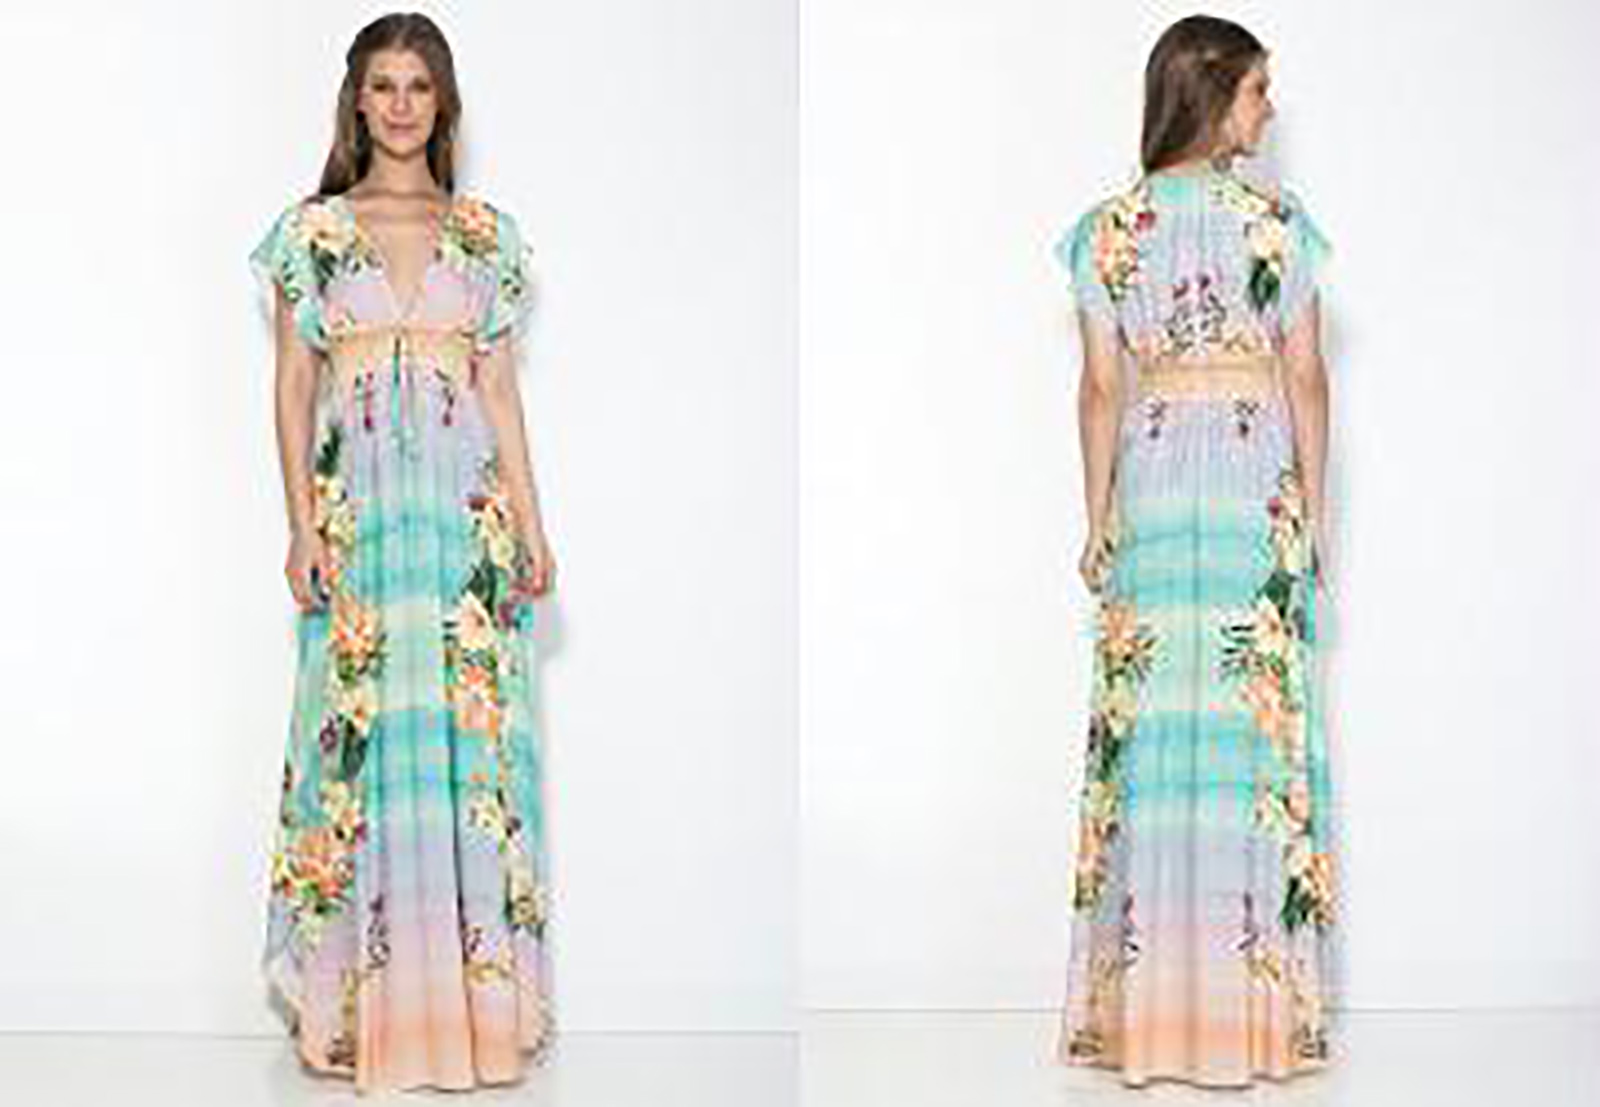 9949661c2 ... Vestido comprido de praia, floral pastel em degradé - VESTIDO LONGO  HORIZONTE FLORIDO